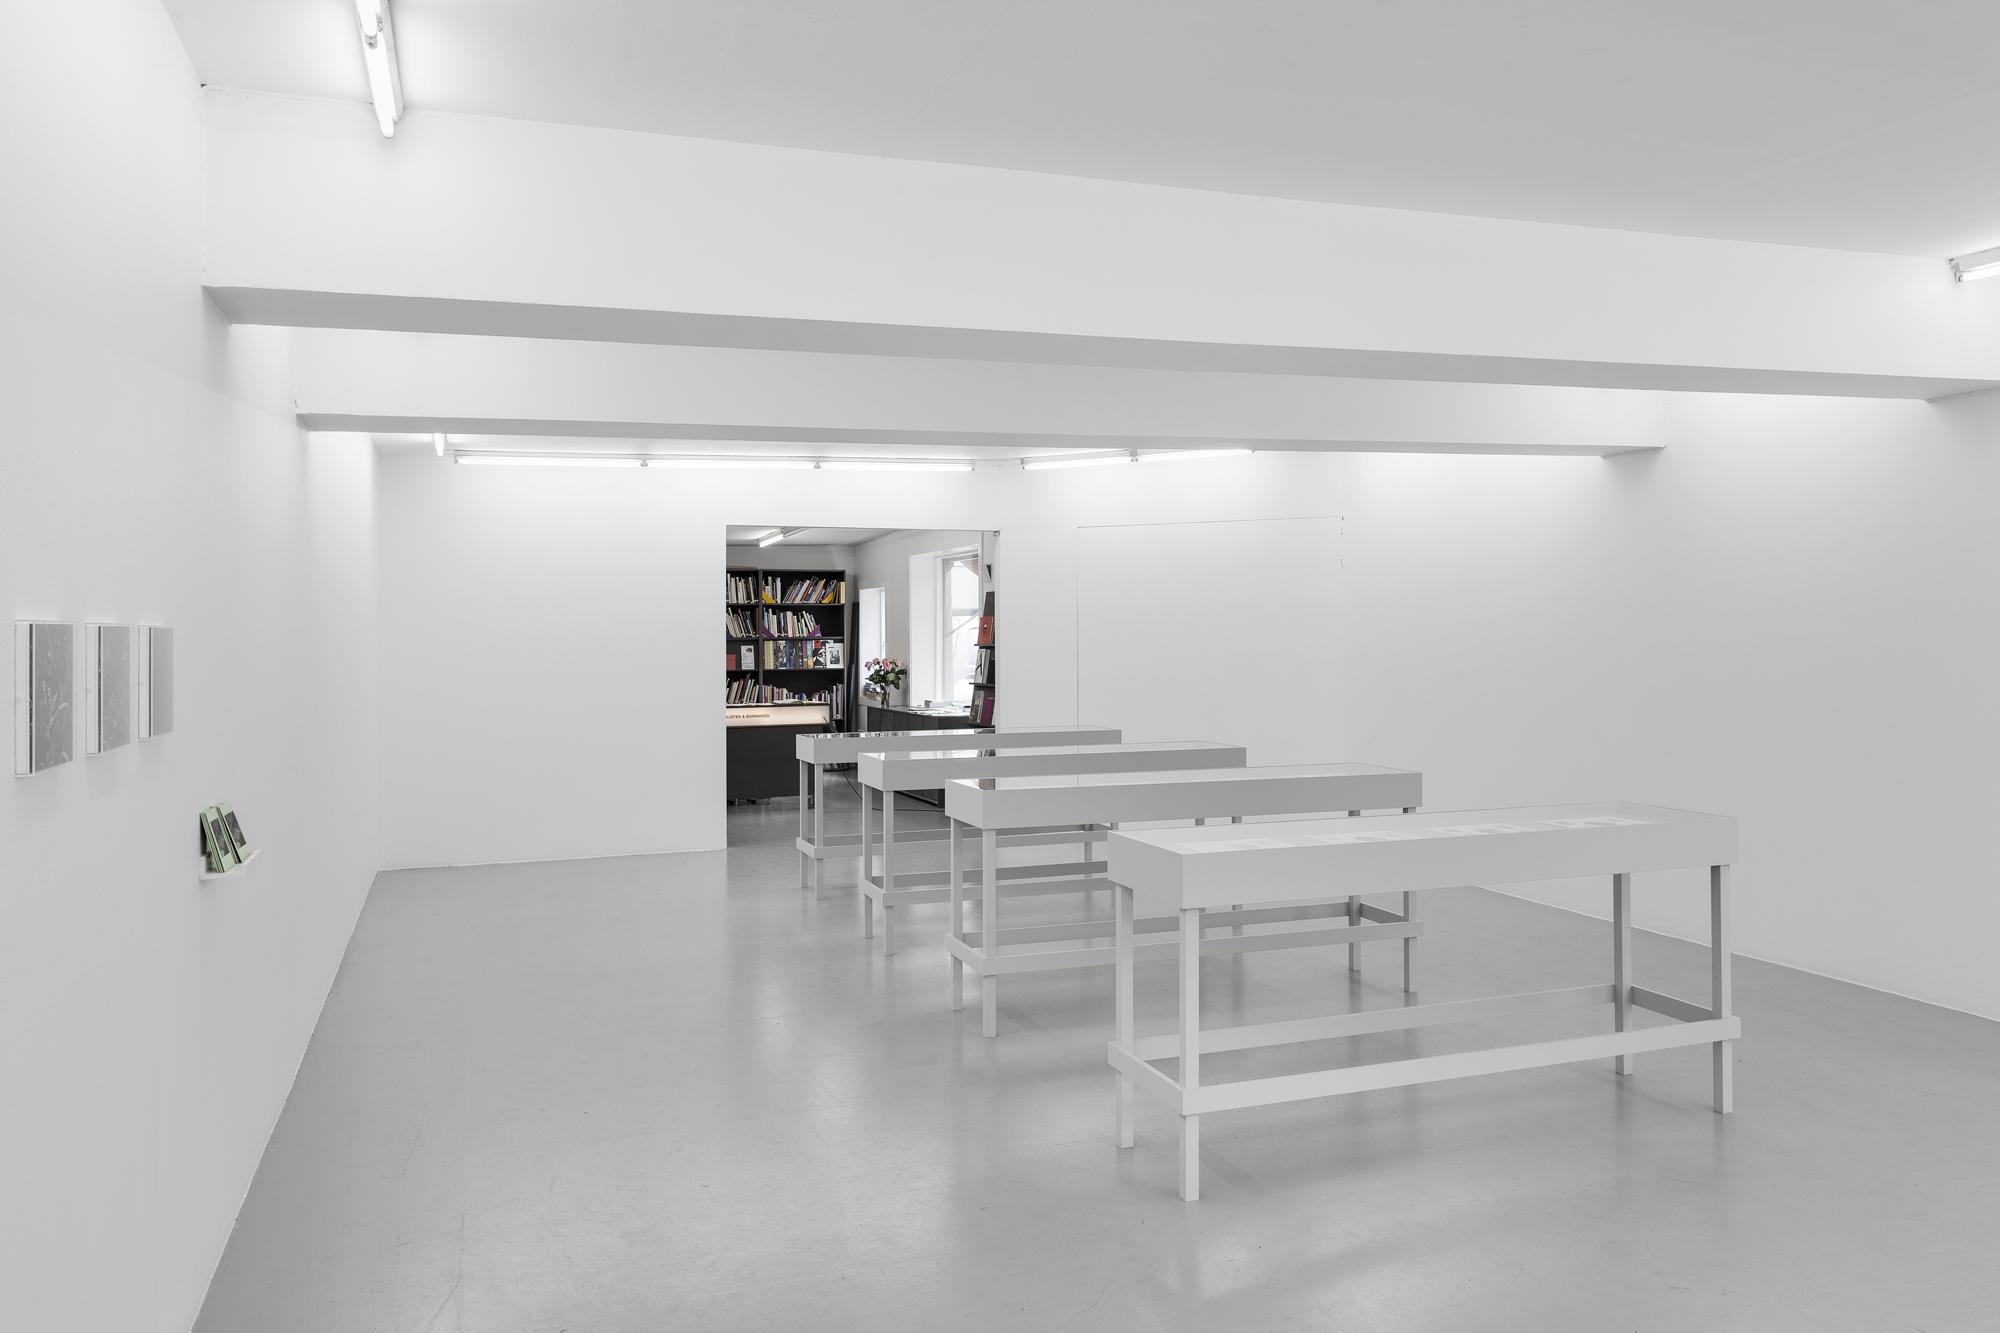 Installation of Album 31,  Fotogalleriet, Oslo , 20.03.2015 - 10.05.2015